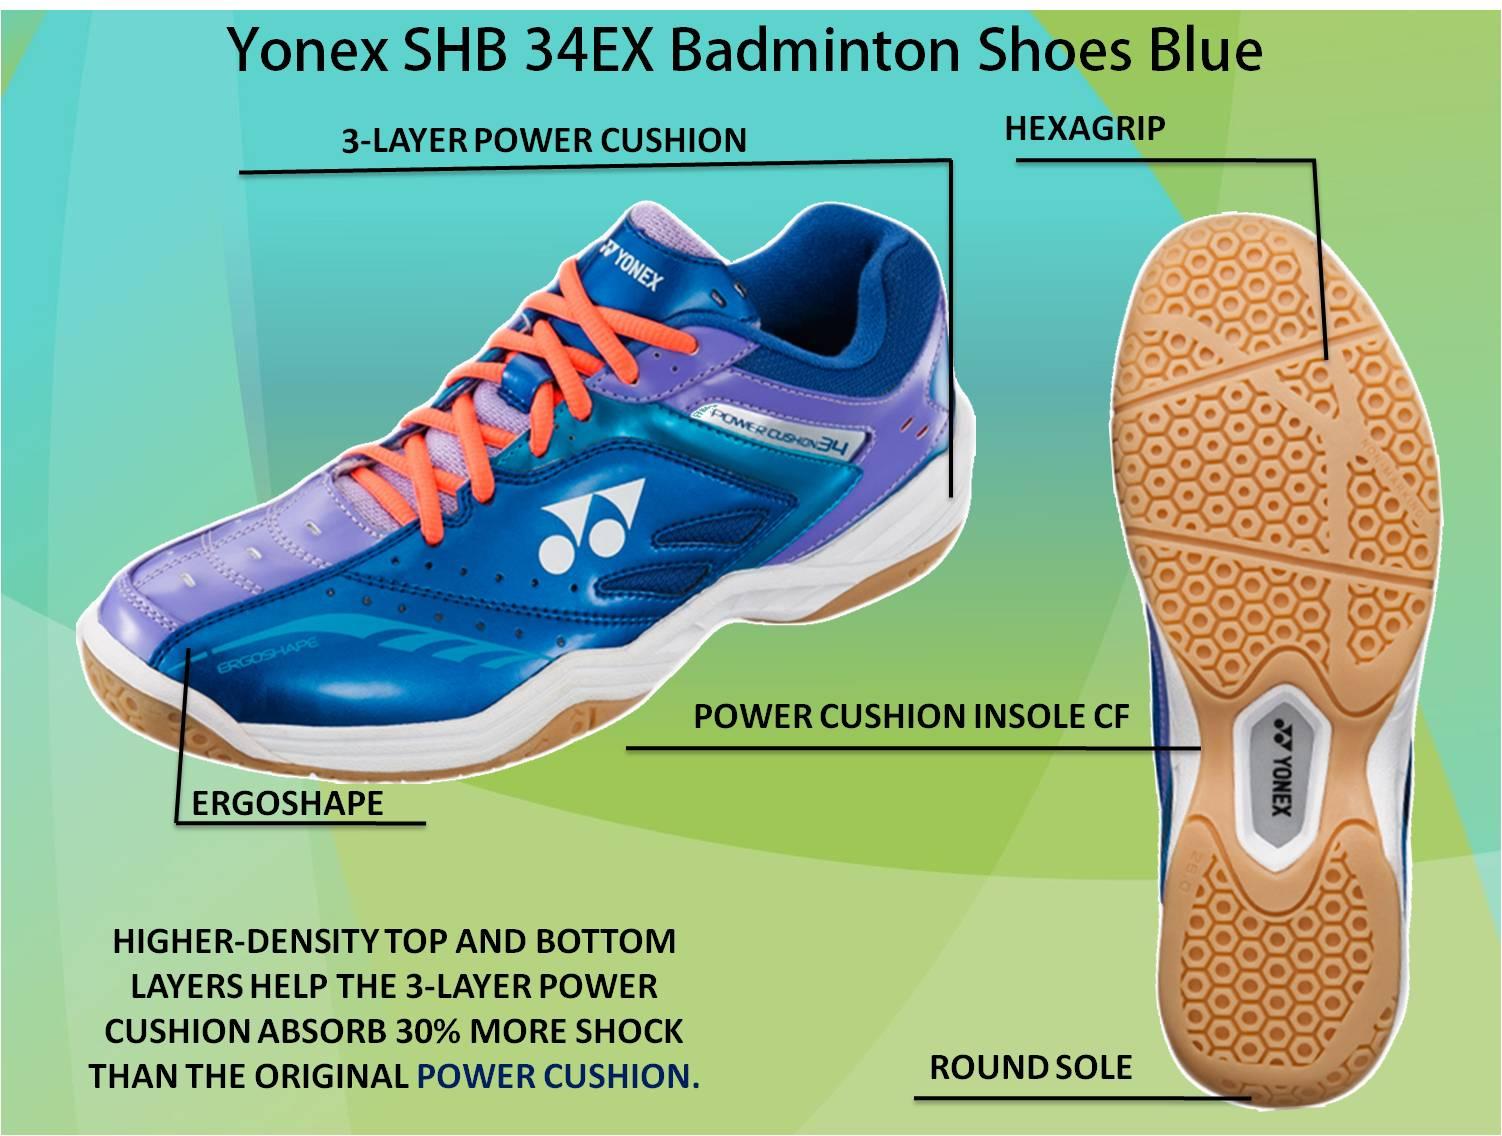 Yonex SHB 34 EX Badminton Shoes Blue